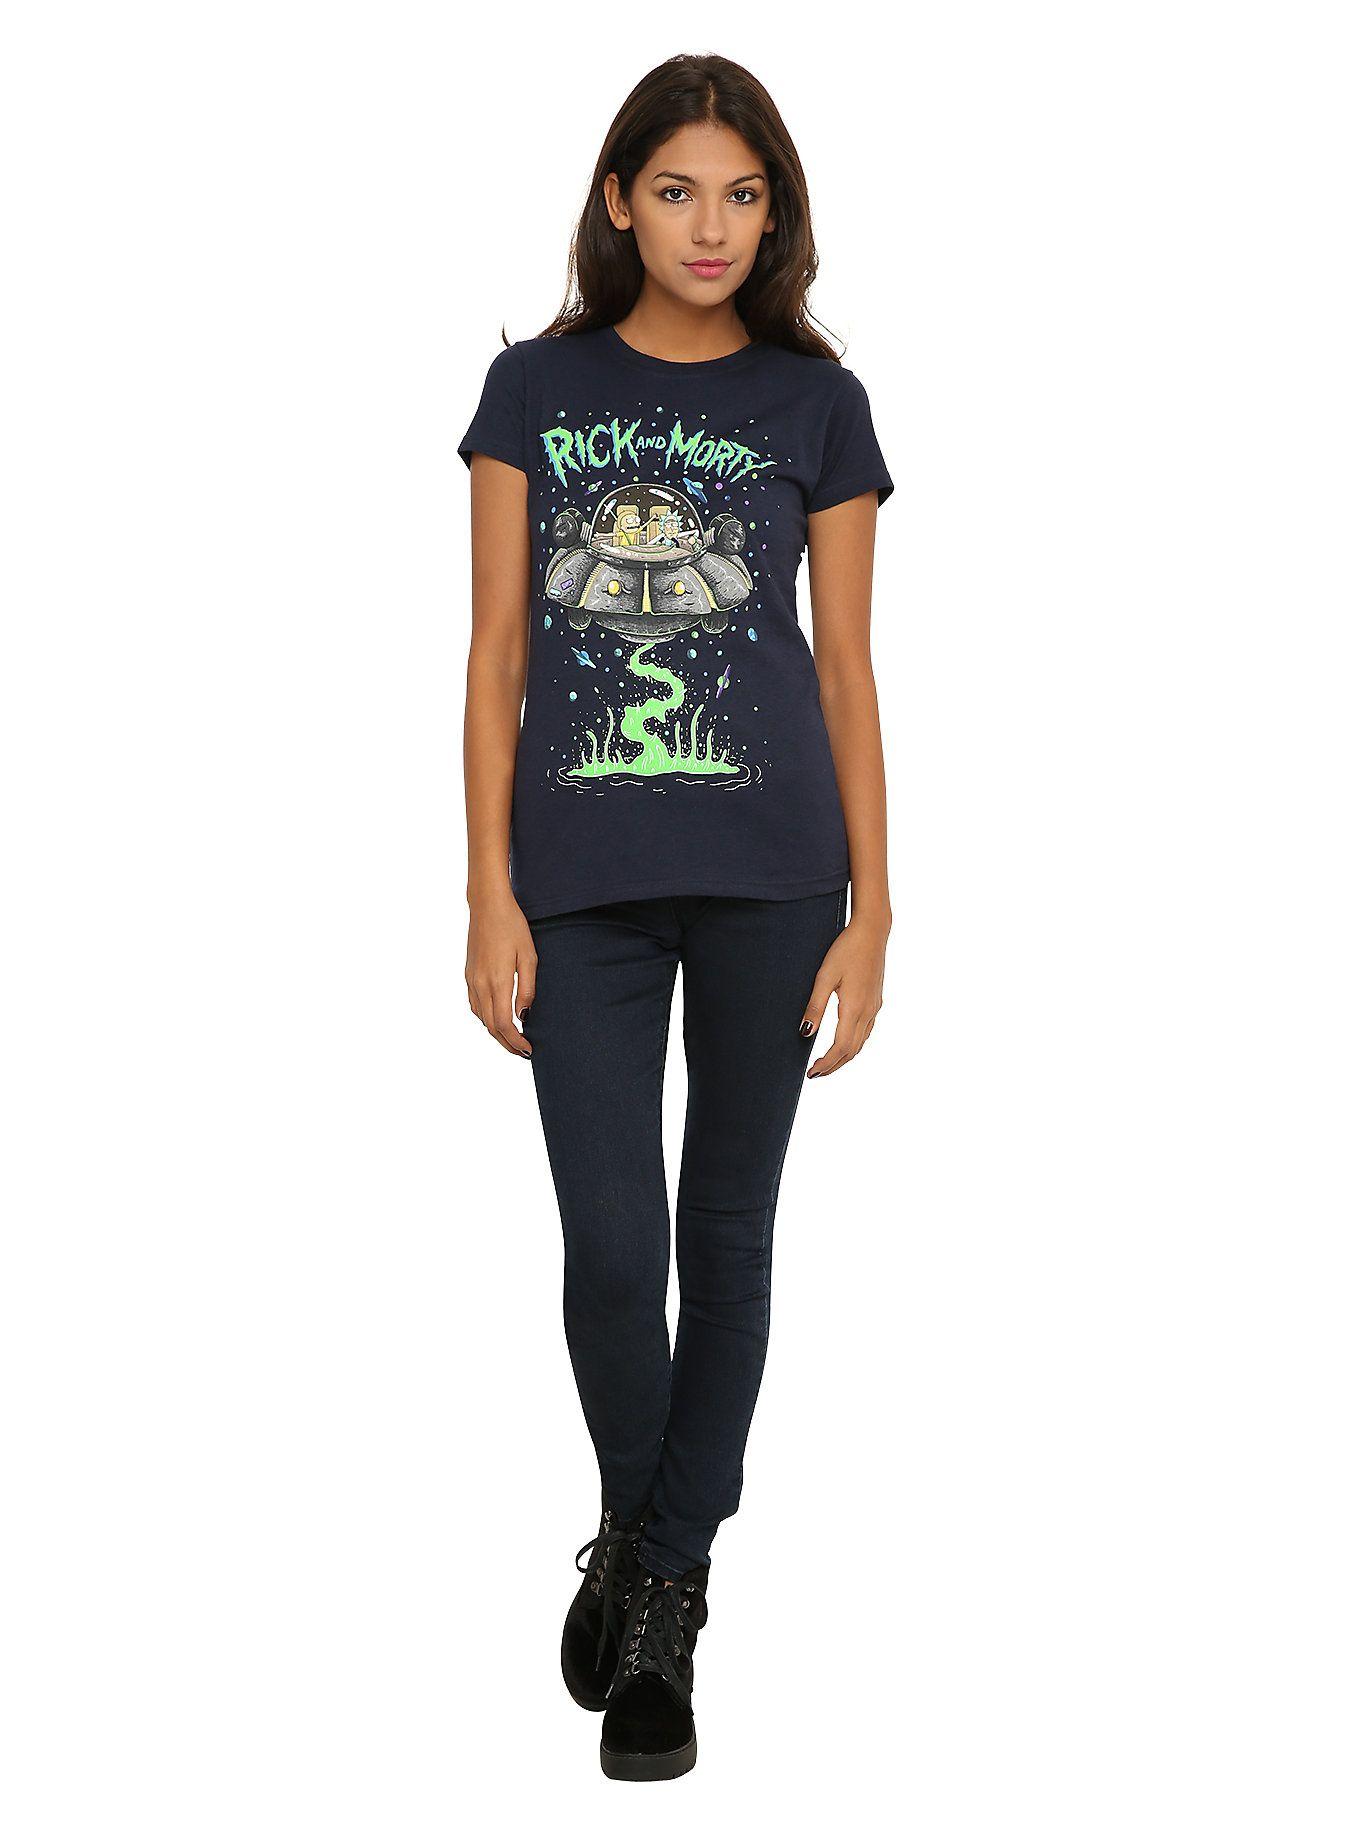 ca160103 Rick And Morty Spaceship Girls T-Shirt   rick and morty   Rick ...